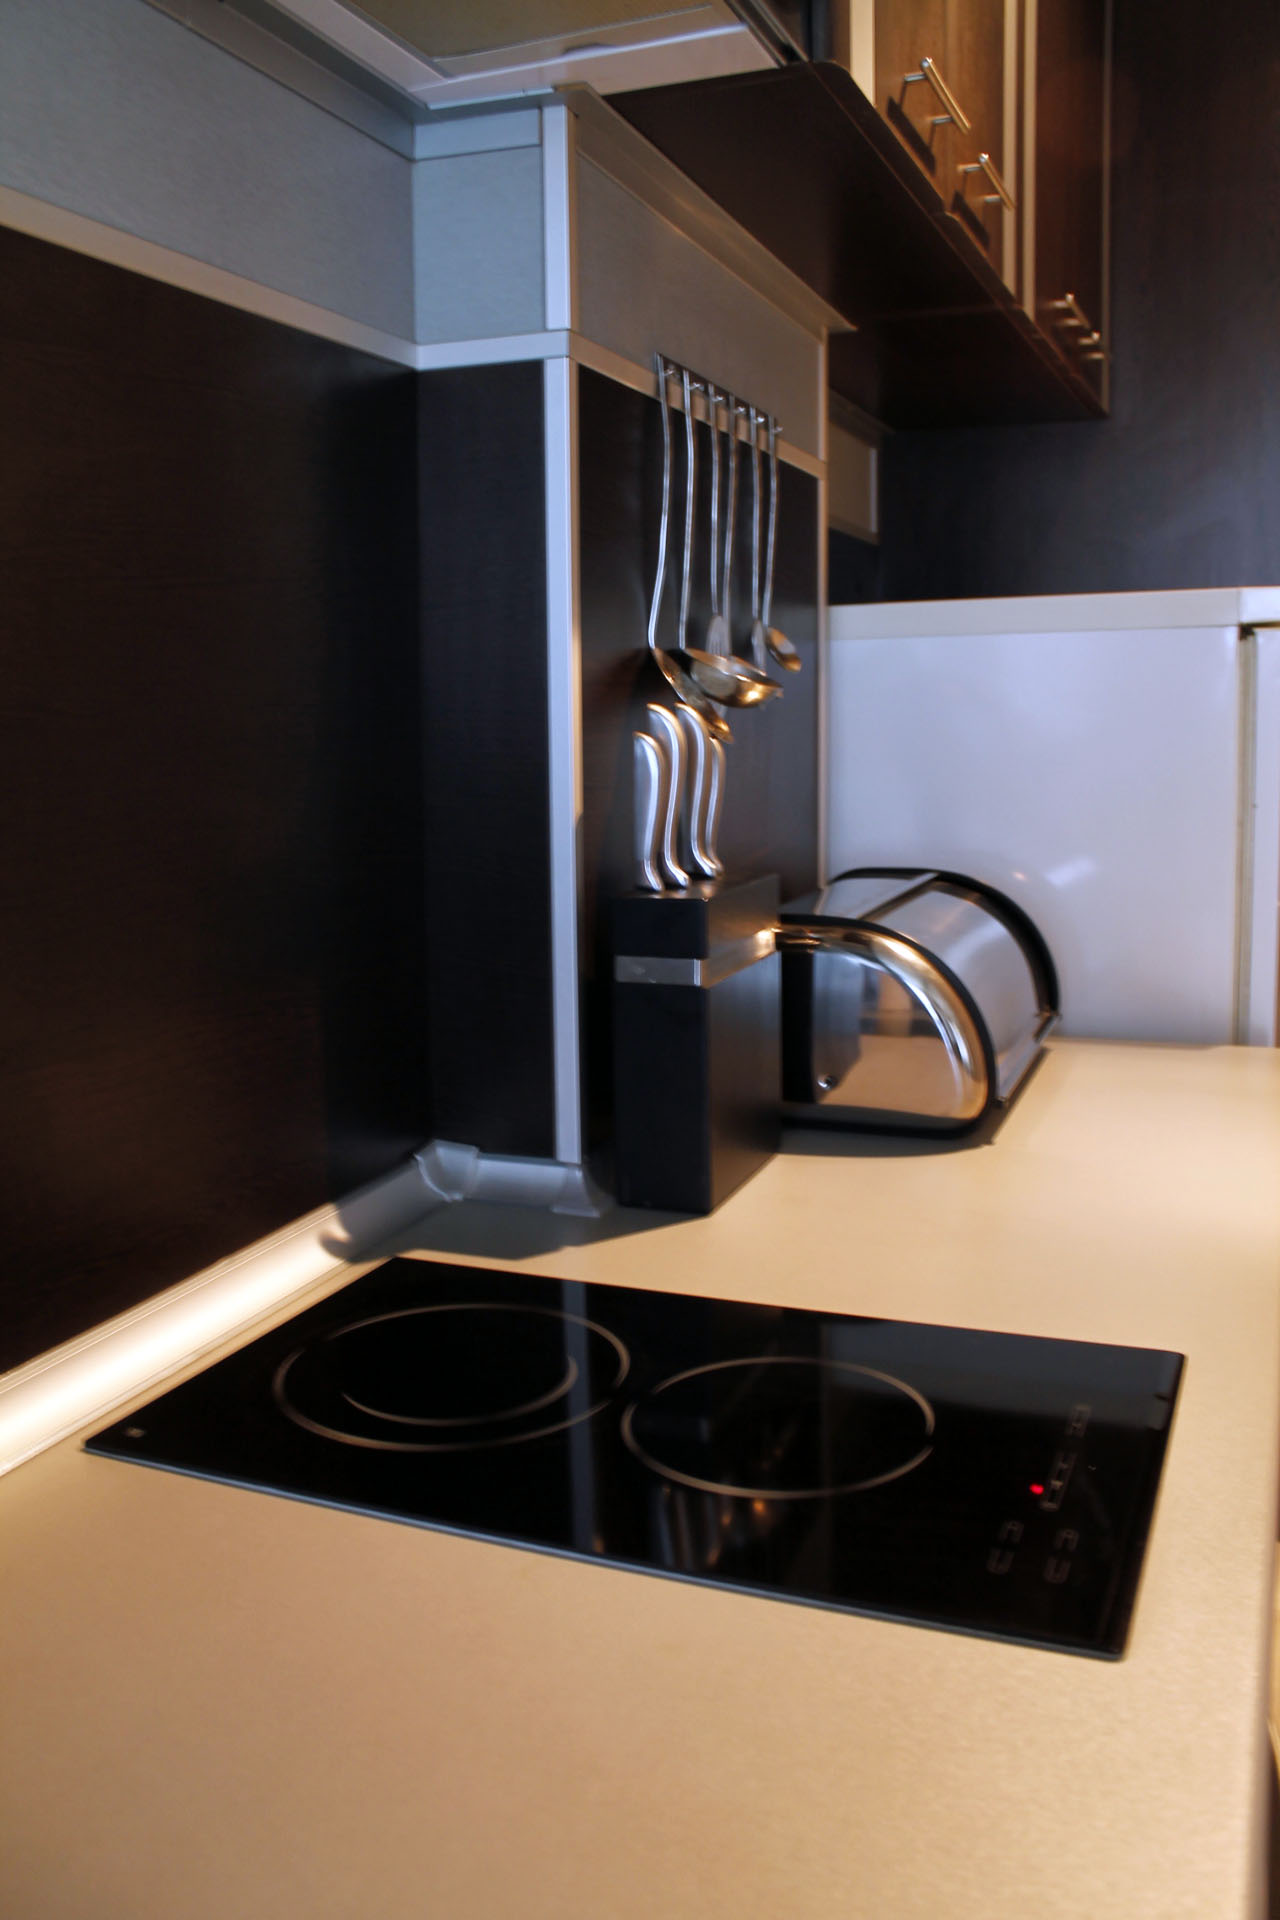 Къща за гости Златоград кухня 6.2